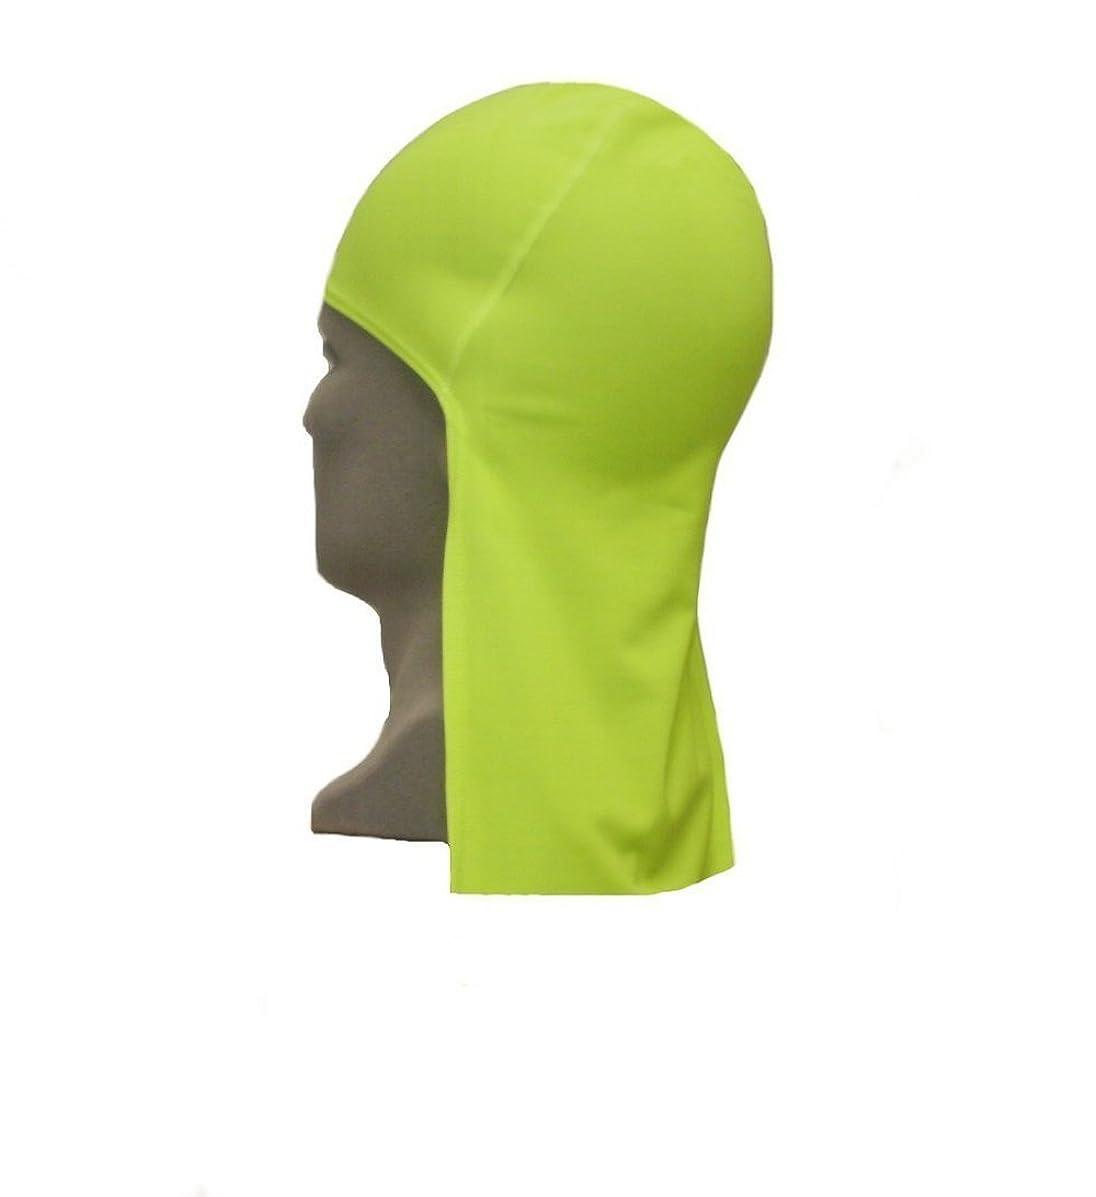 CODA CAP UPF 50+ Beanie Hat with Neck Shade, Lime